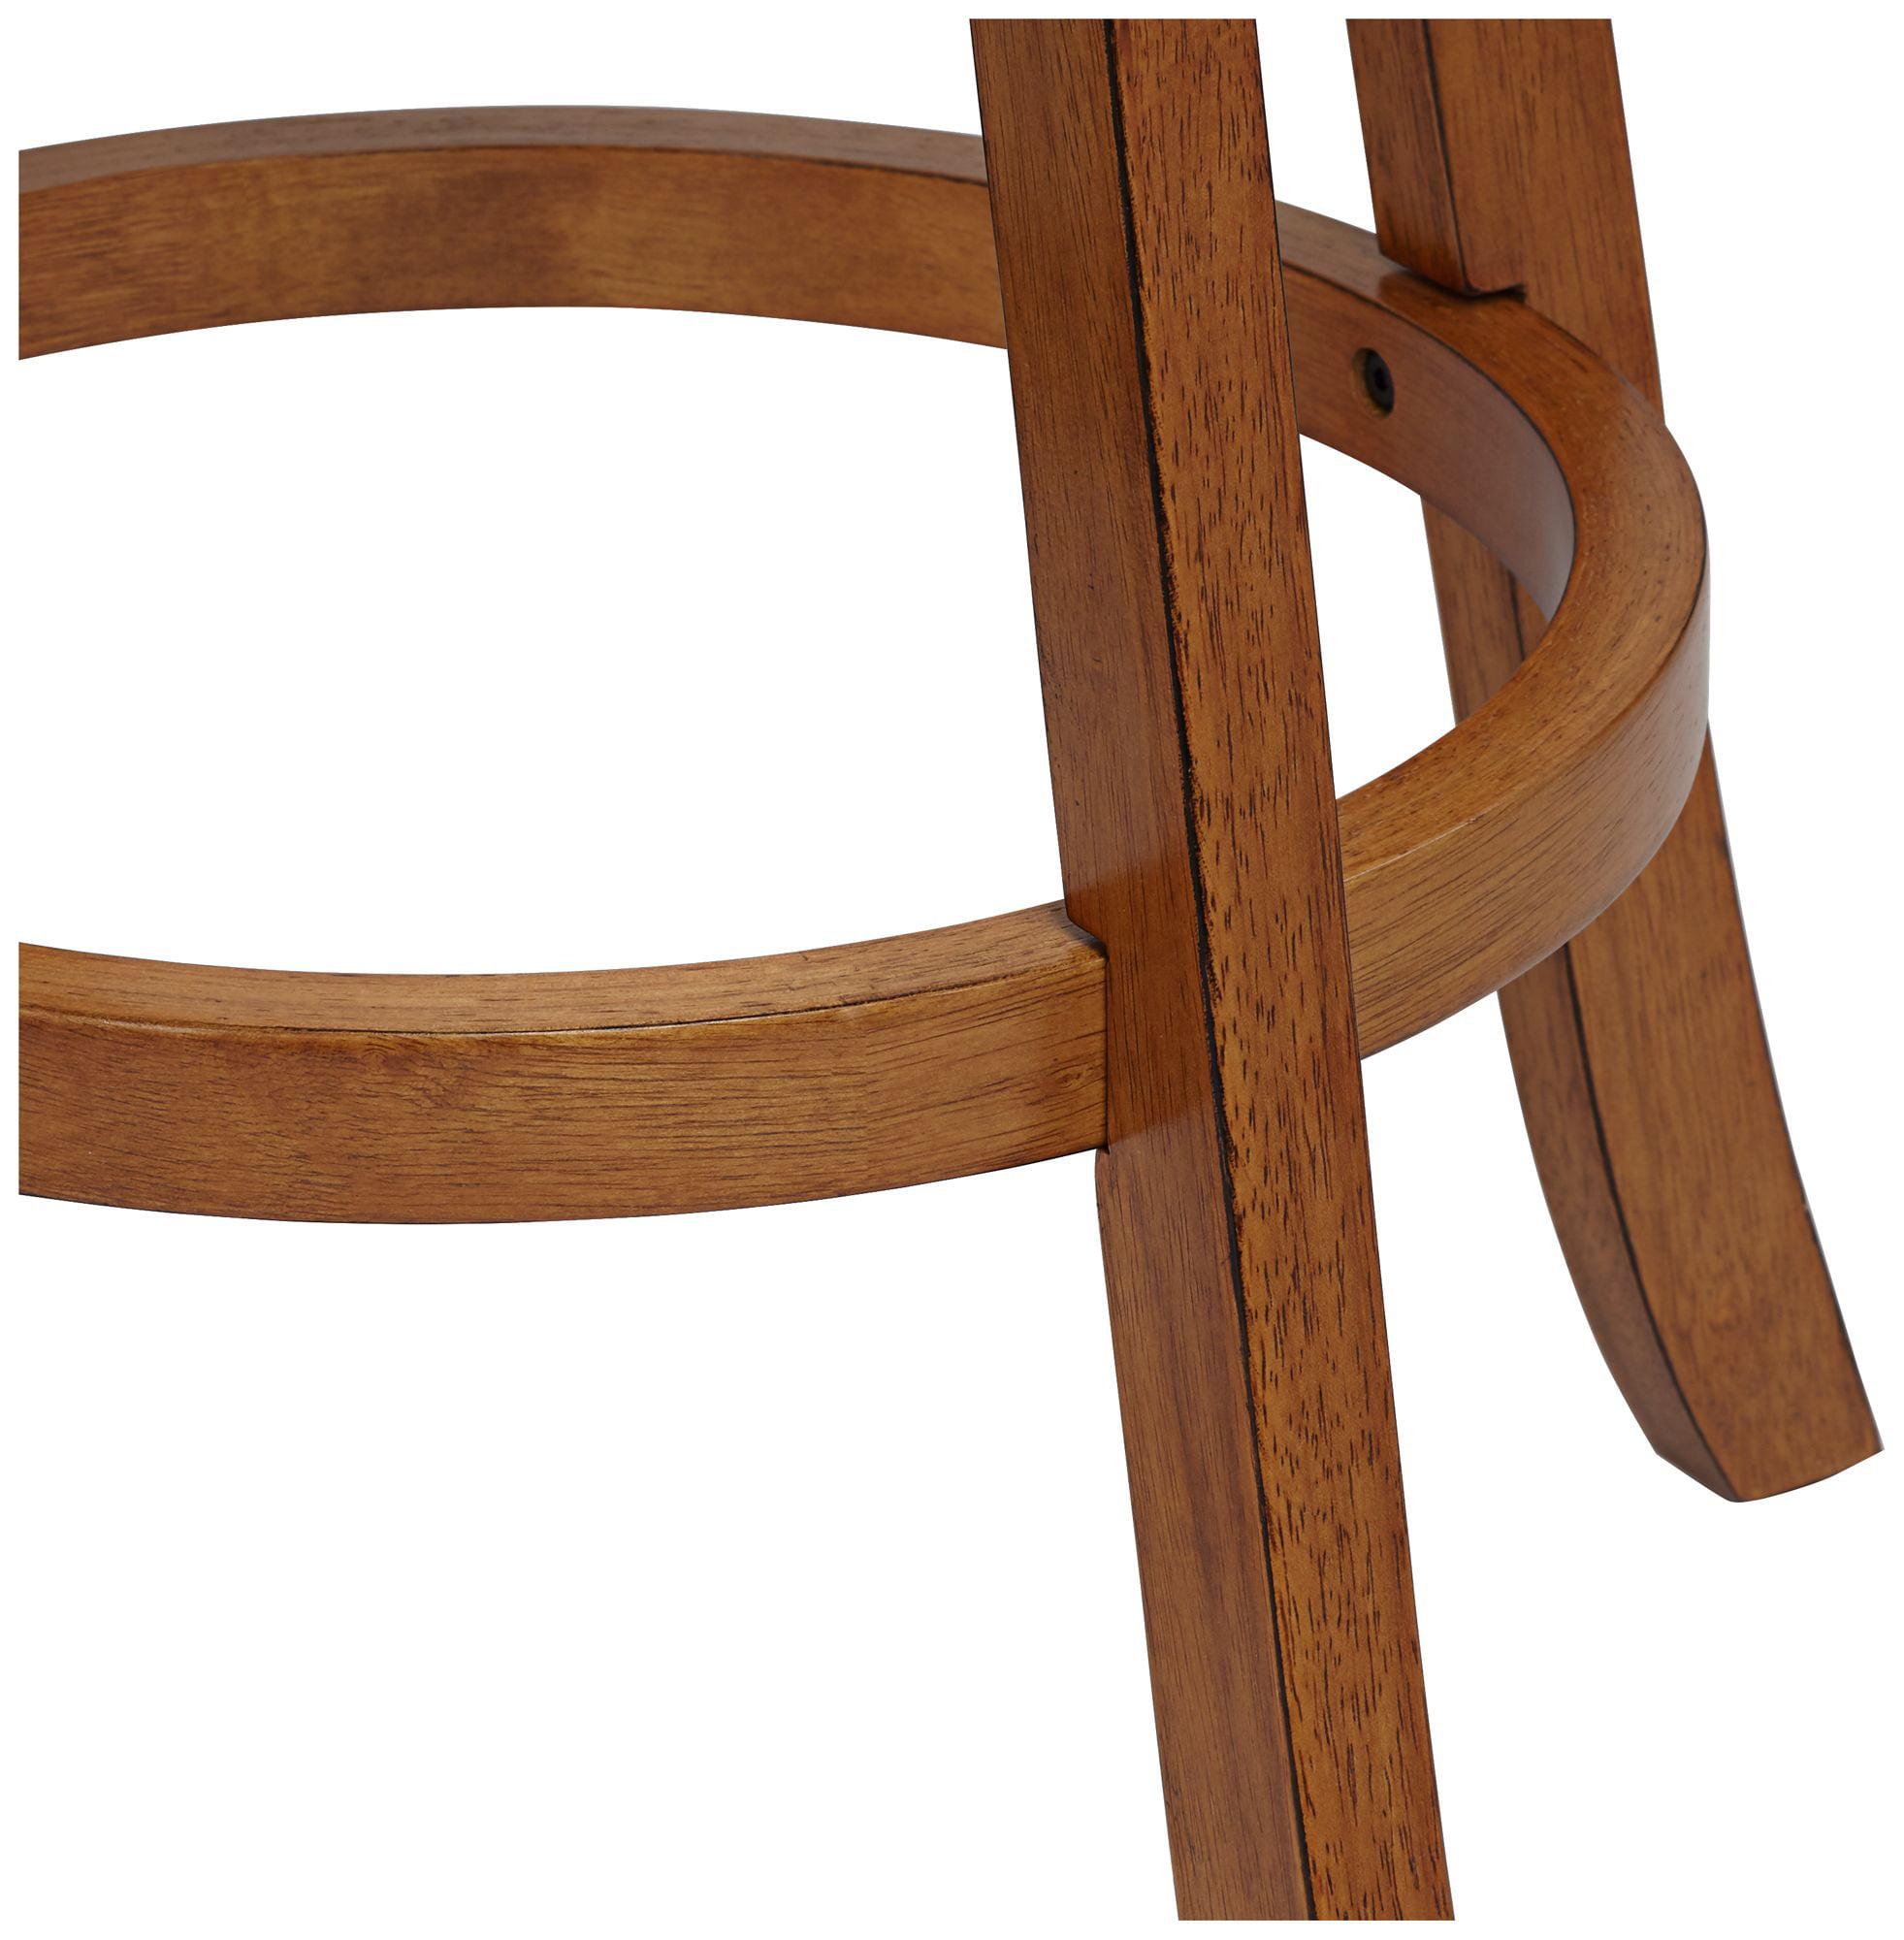 Hillsdale Furniture Fairfox Swivel Bar Stool, Medium Oak - Walmart.com